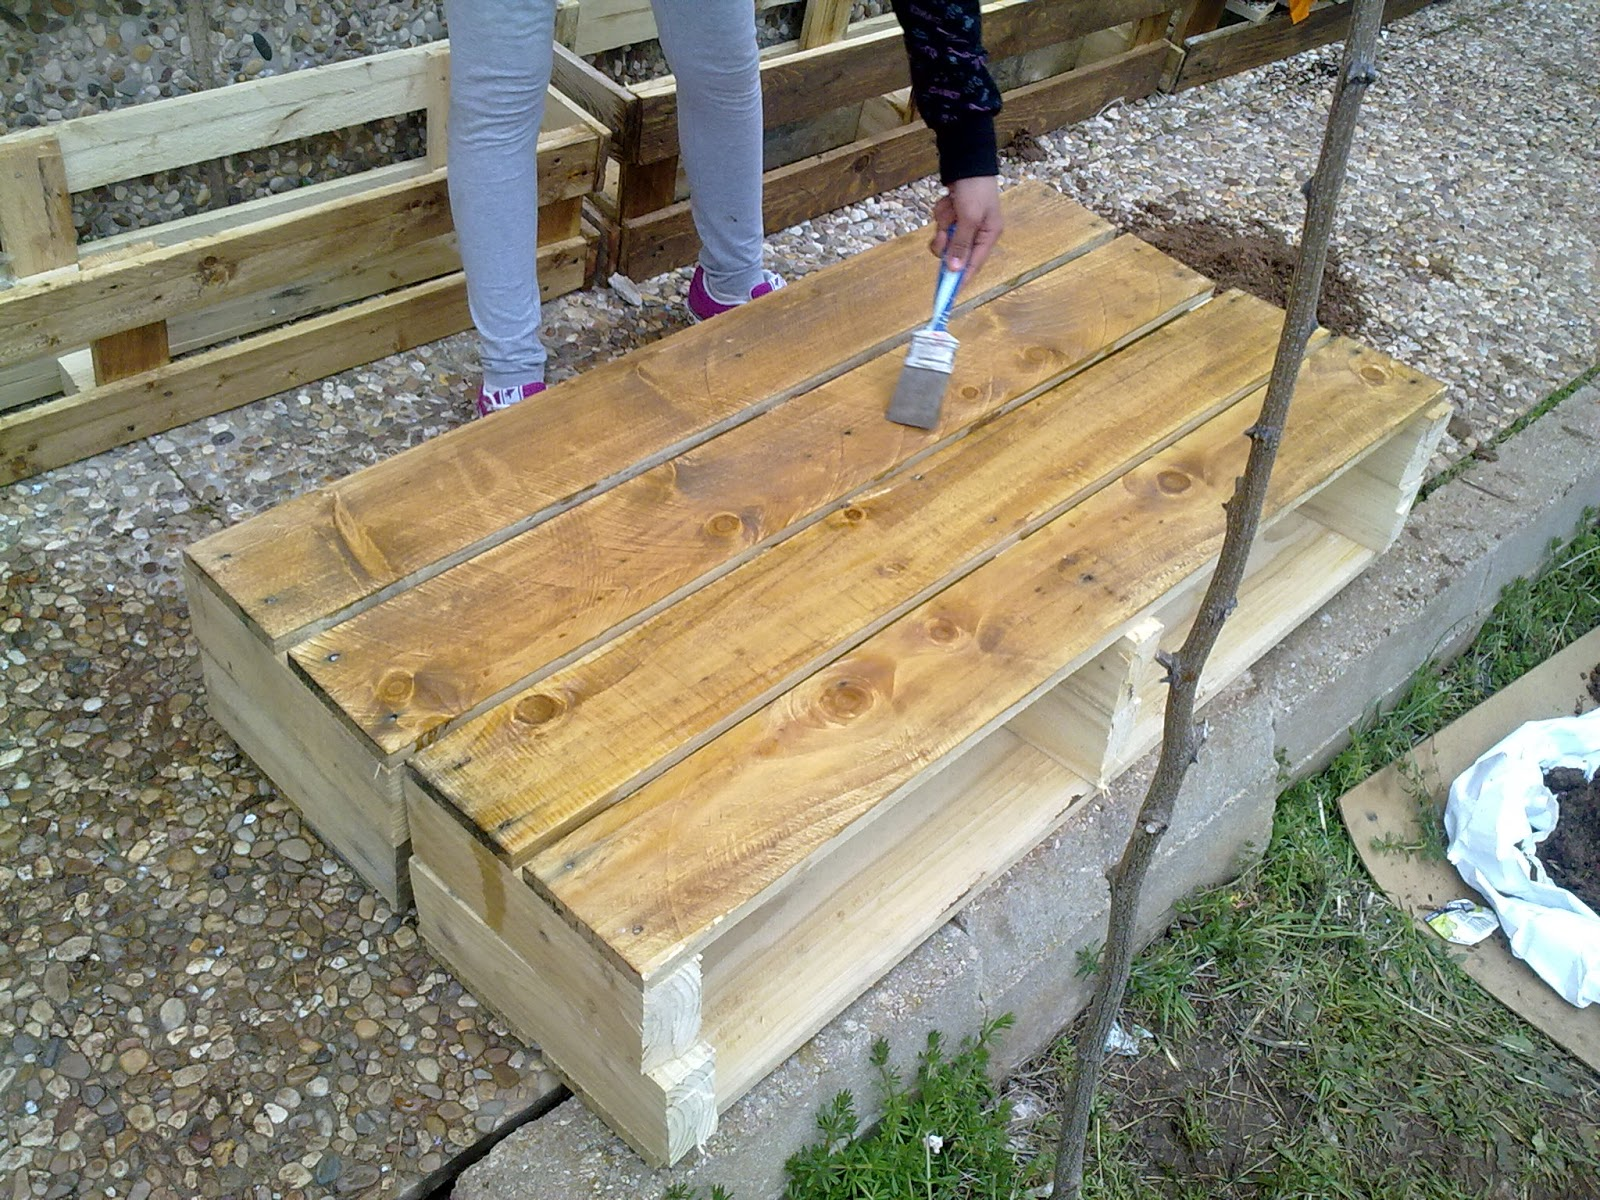 Huertogiraldo jardineras de madera for Jardineras verticales de madera